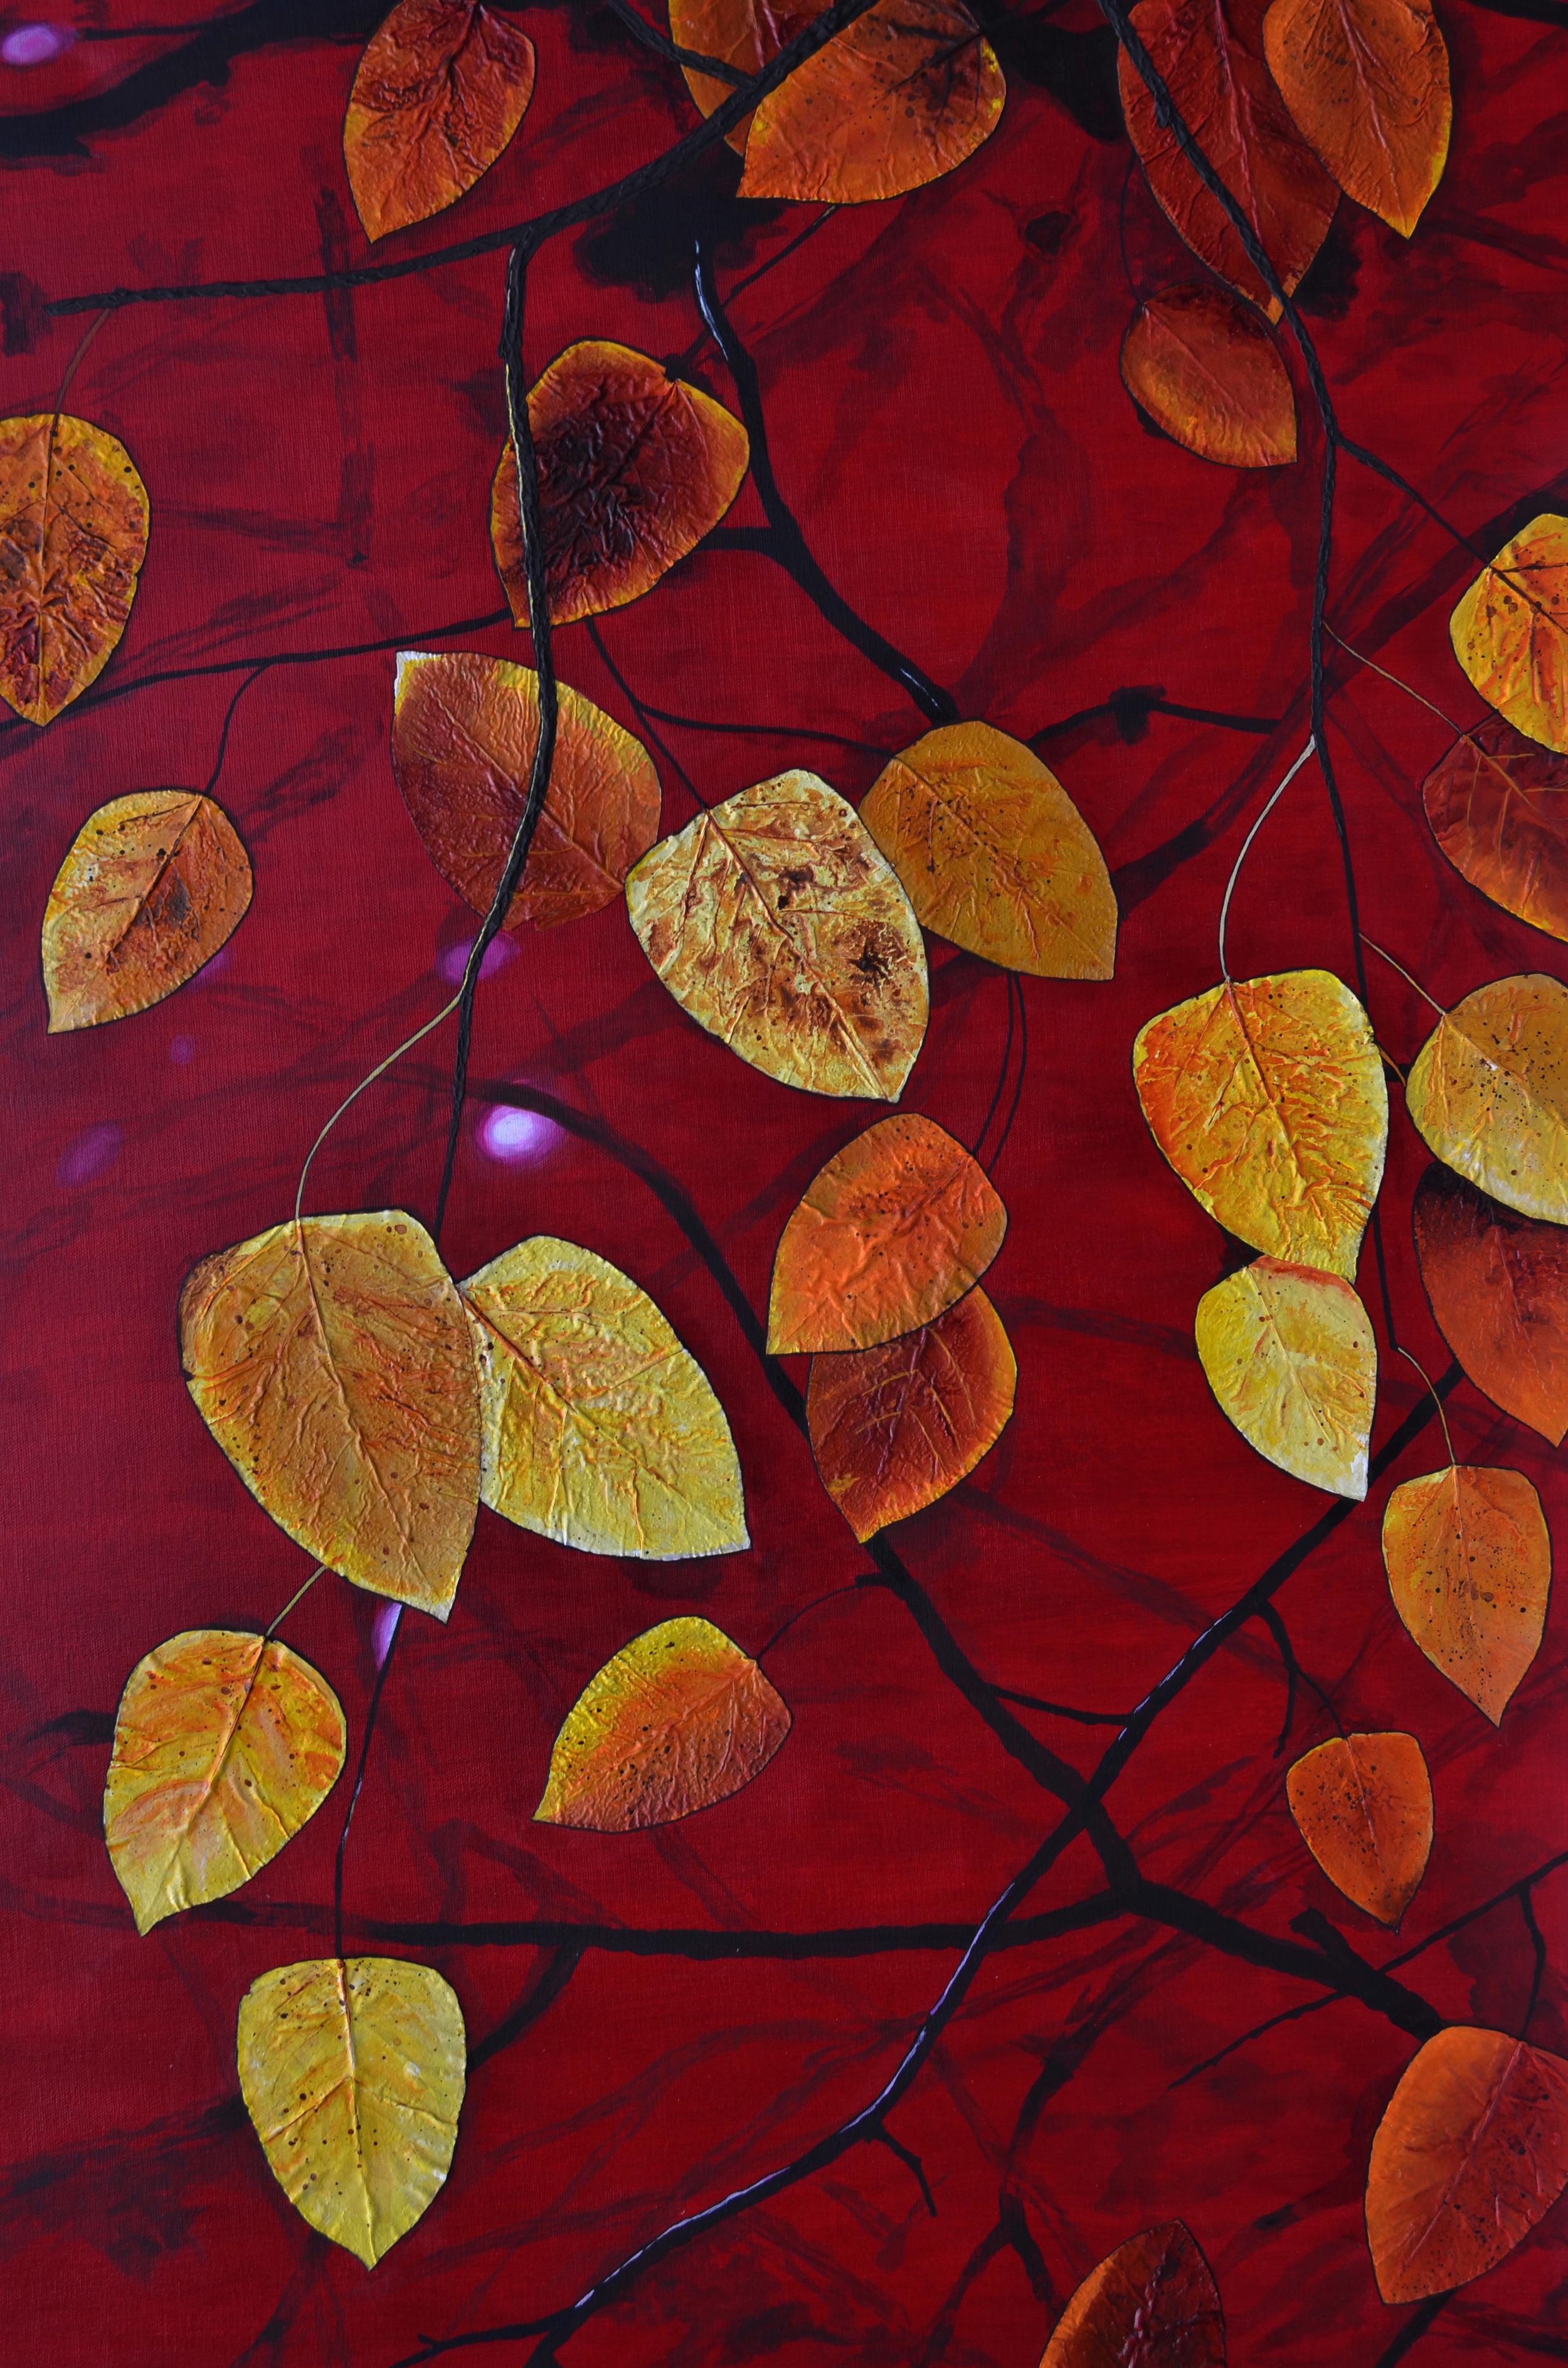 Sunset Autum Leaves Collage.jpg